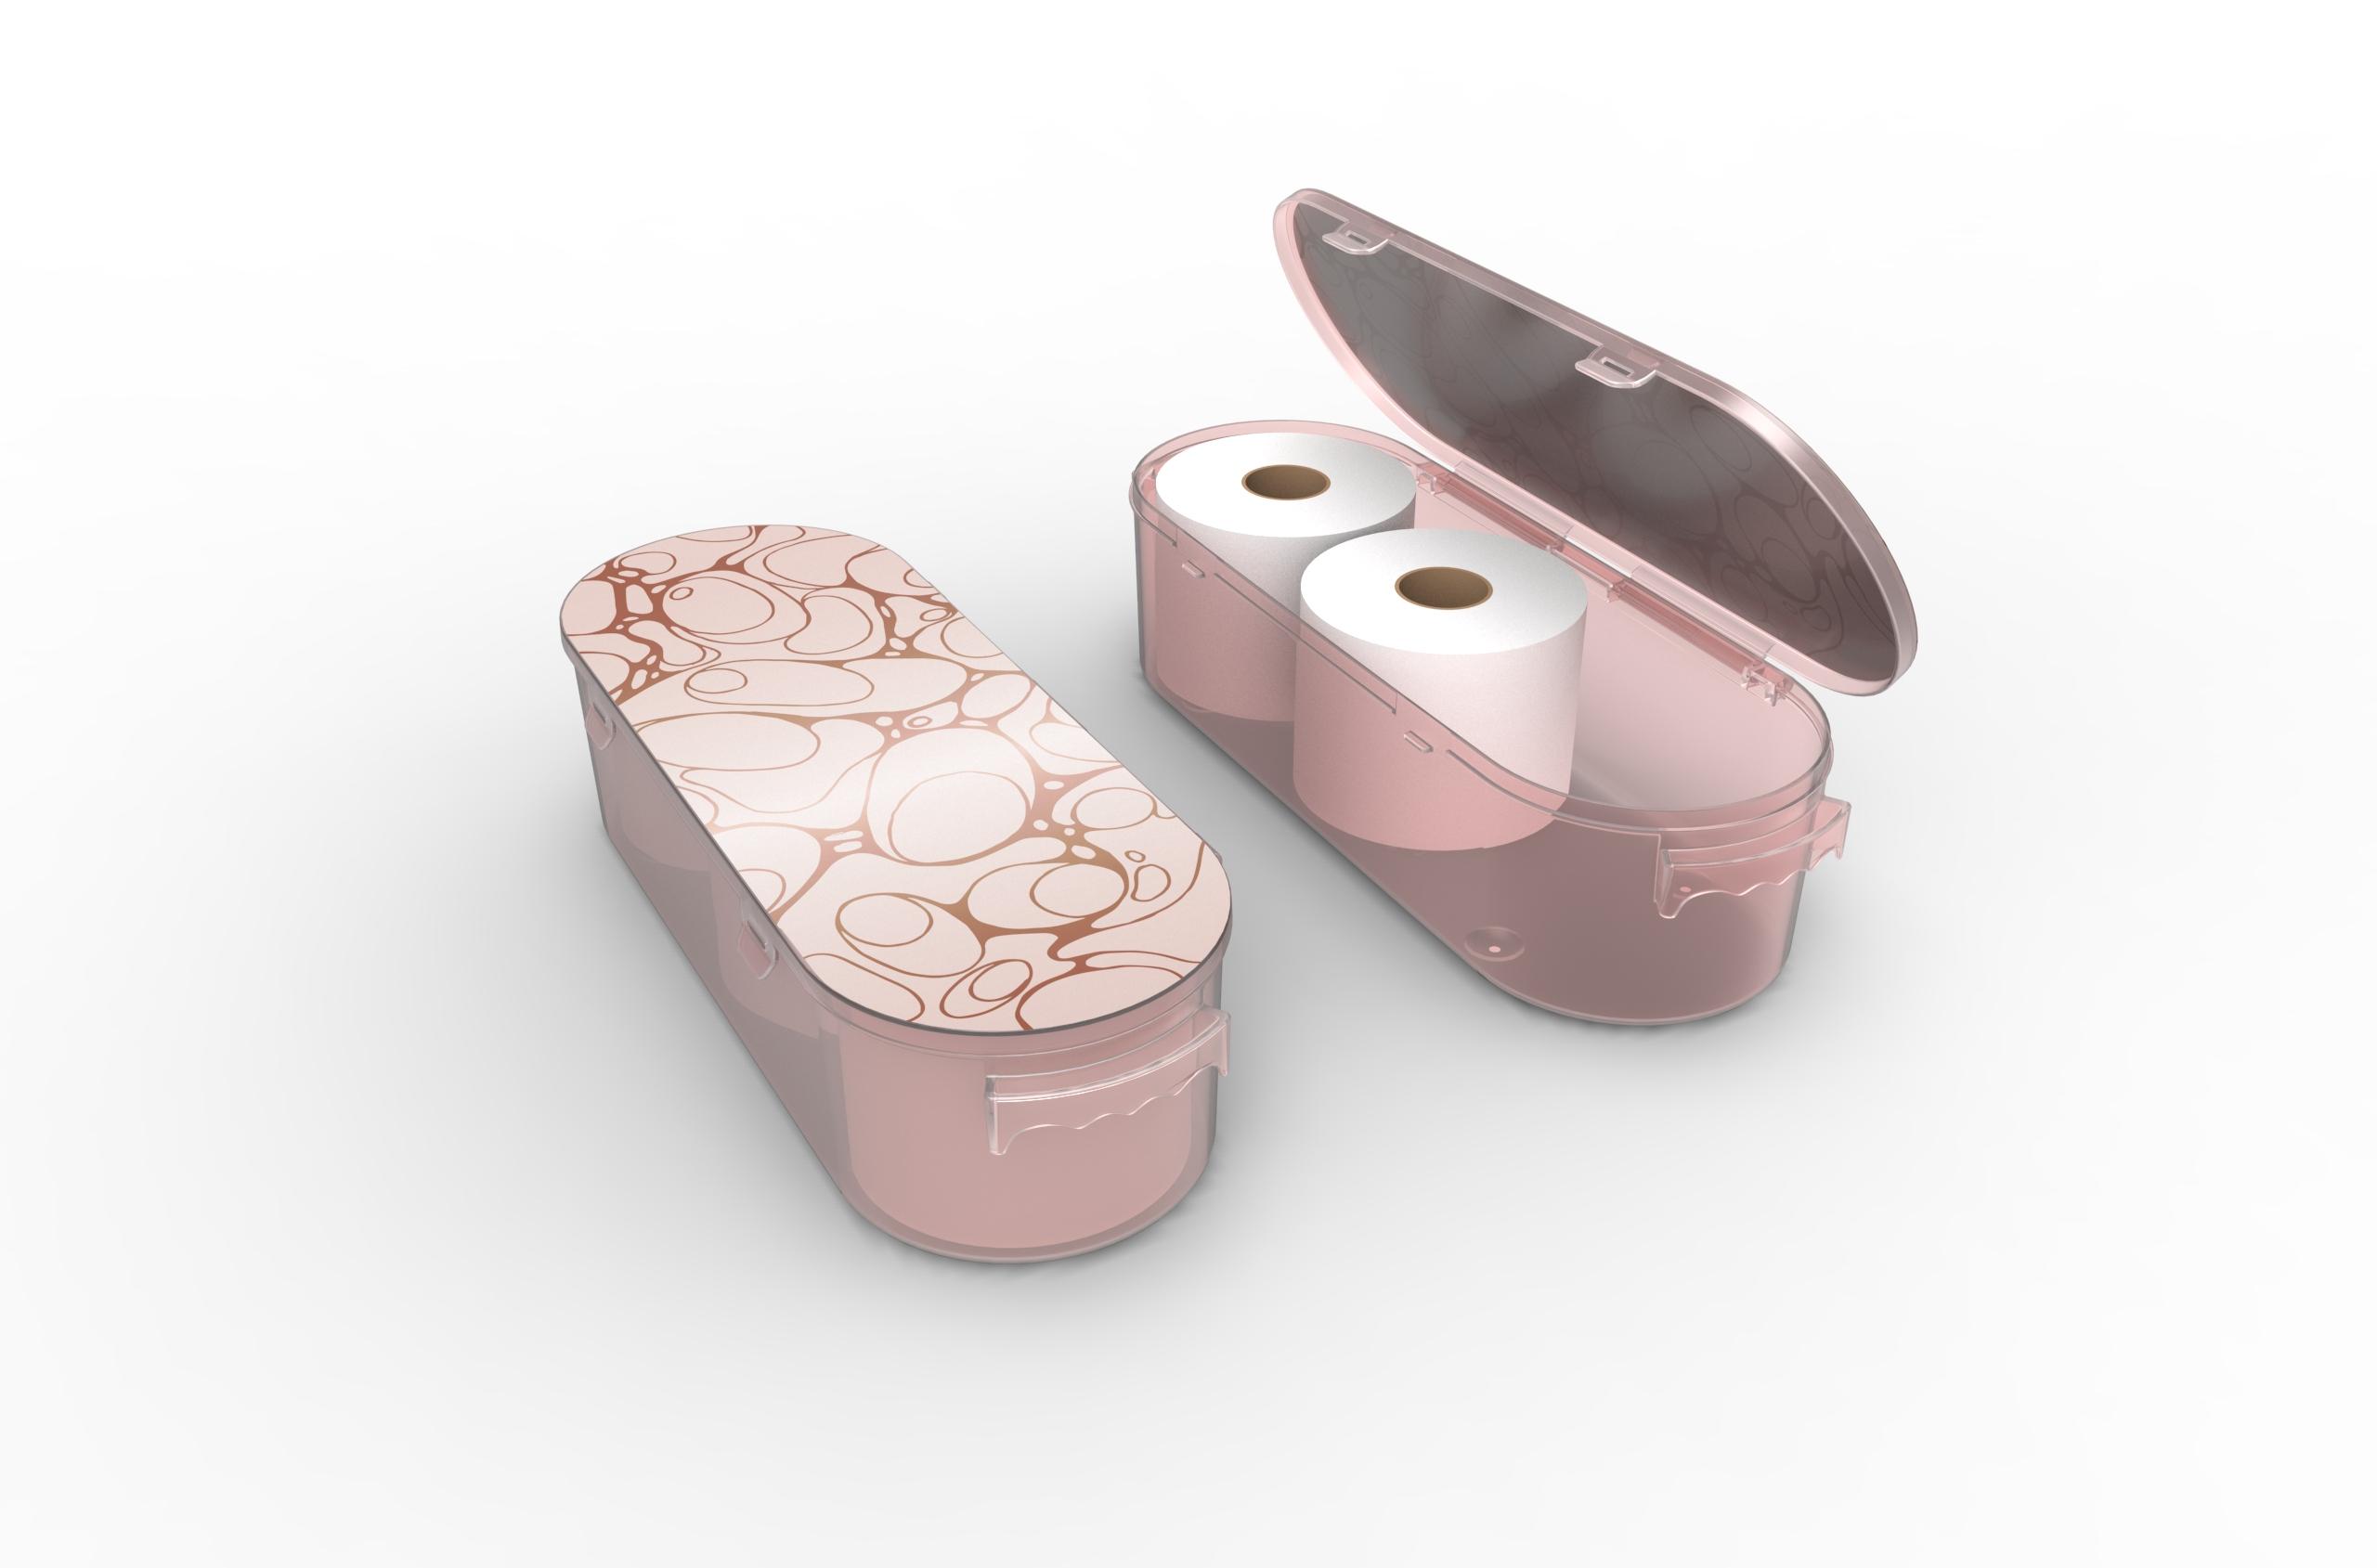 Nykia Designs Bathroom Toilet Paper Storage Solution - Rose Gold